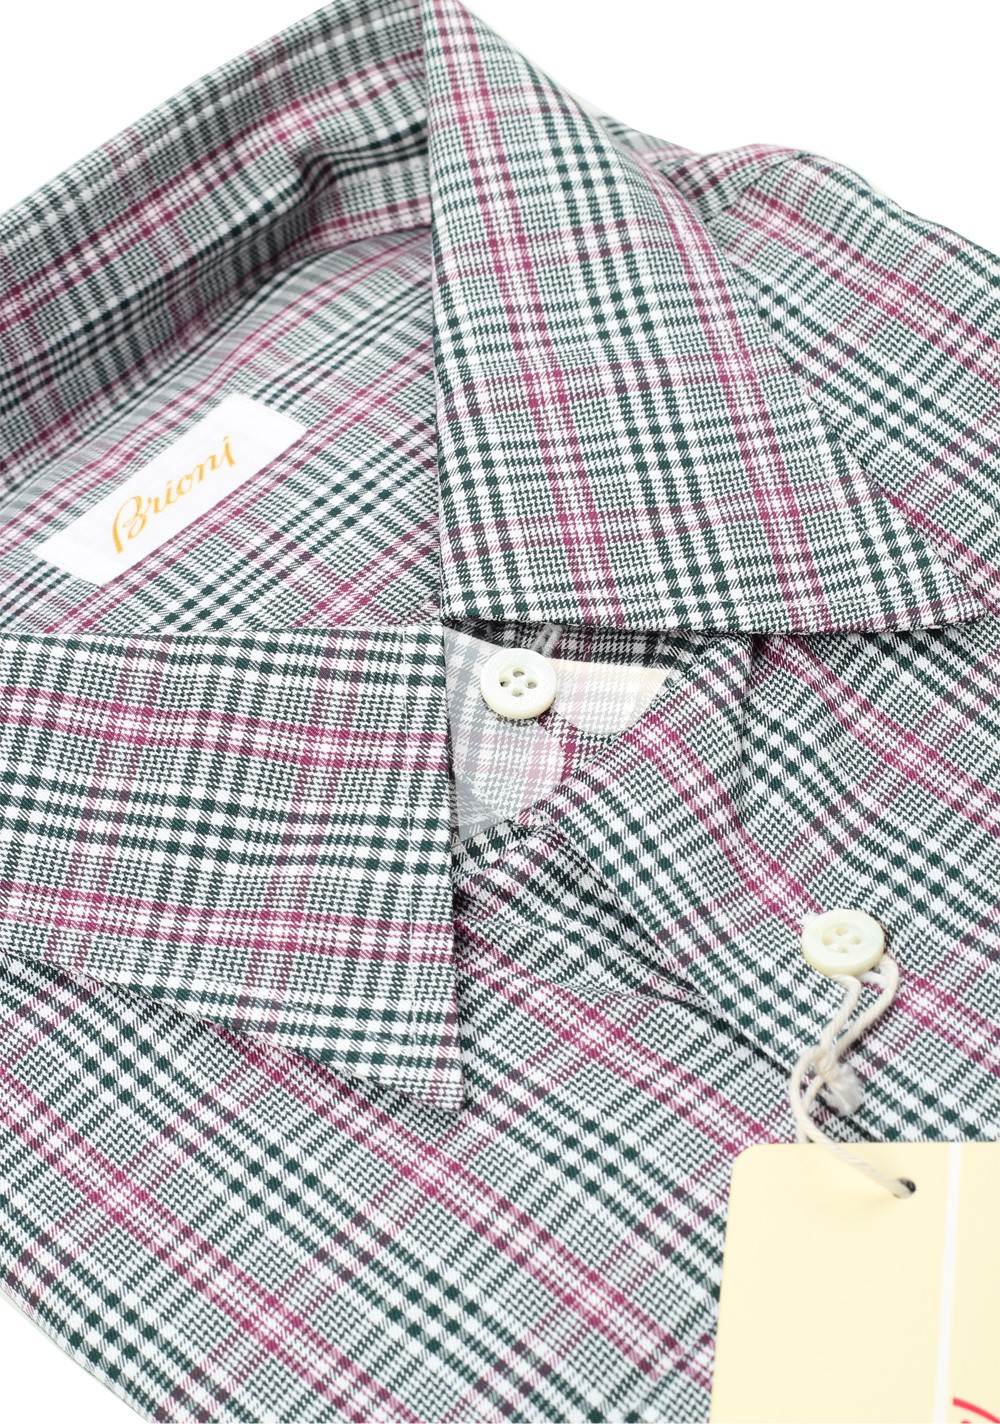 Brioni Shirt Size II – 39 / 15.5 U.S. | Costume Limité